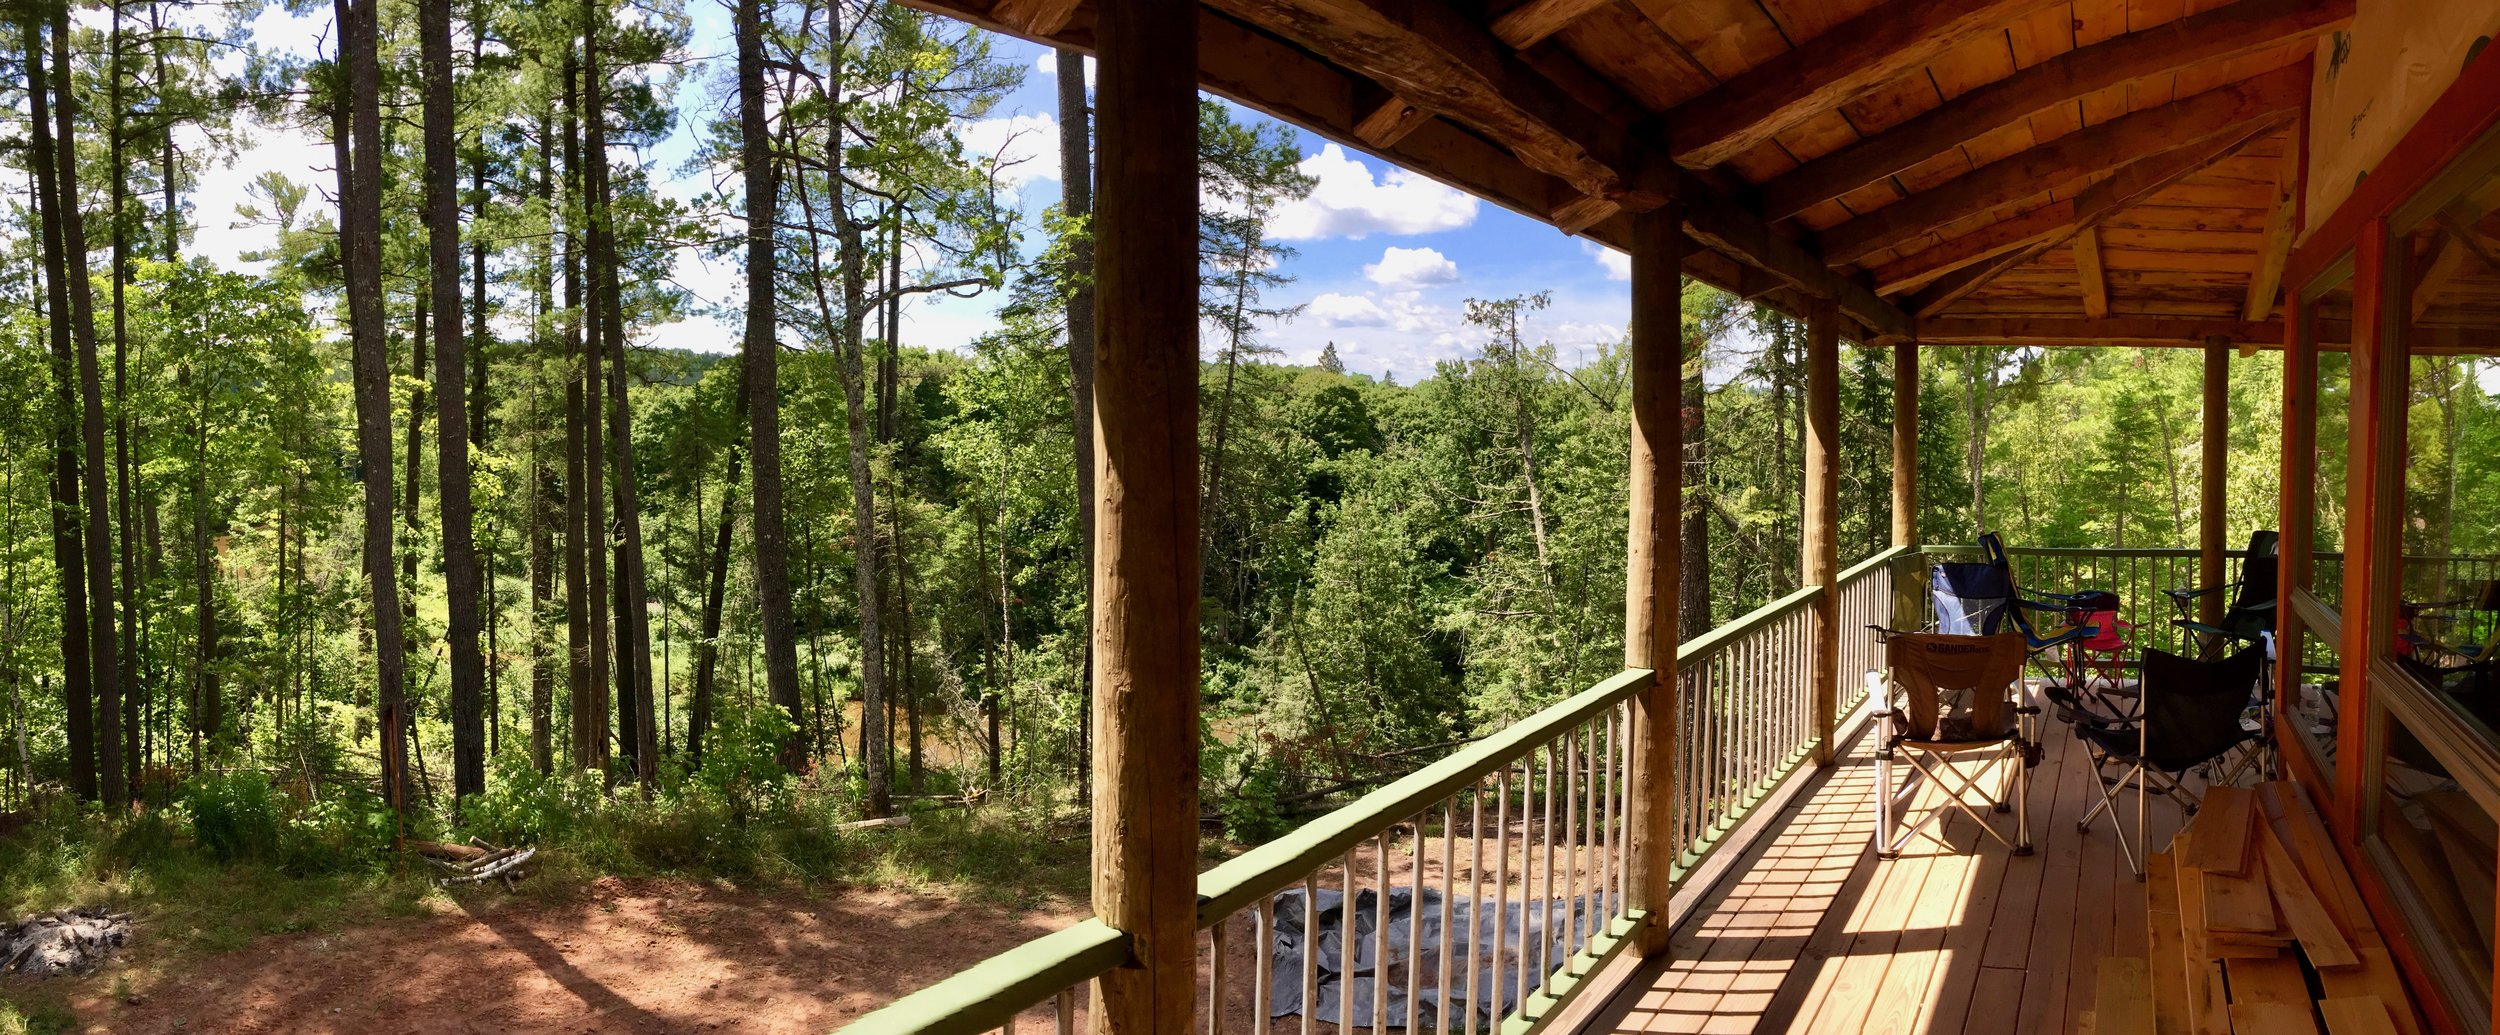 Camp Whiskey Hollow in Ontonagon, Michigan.